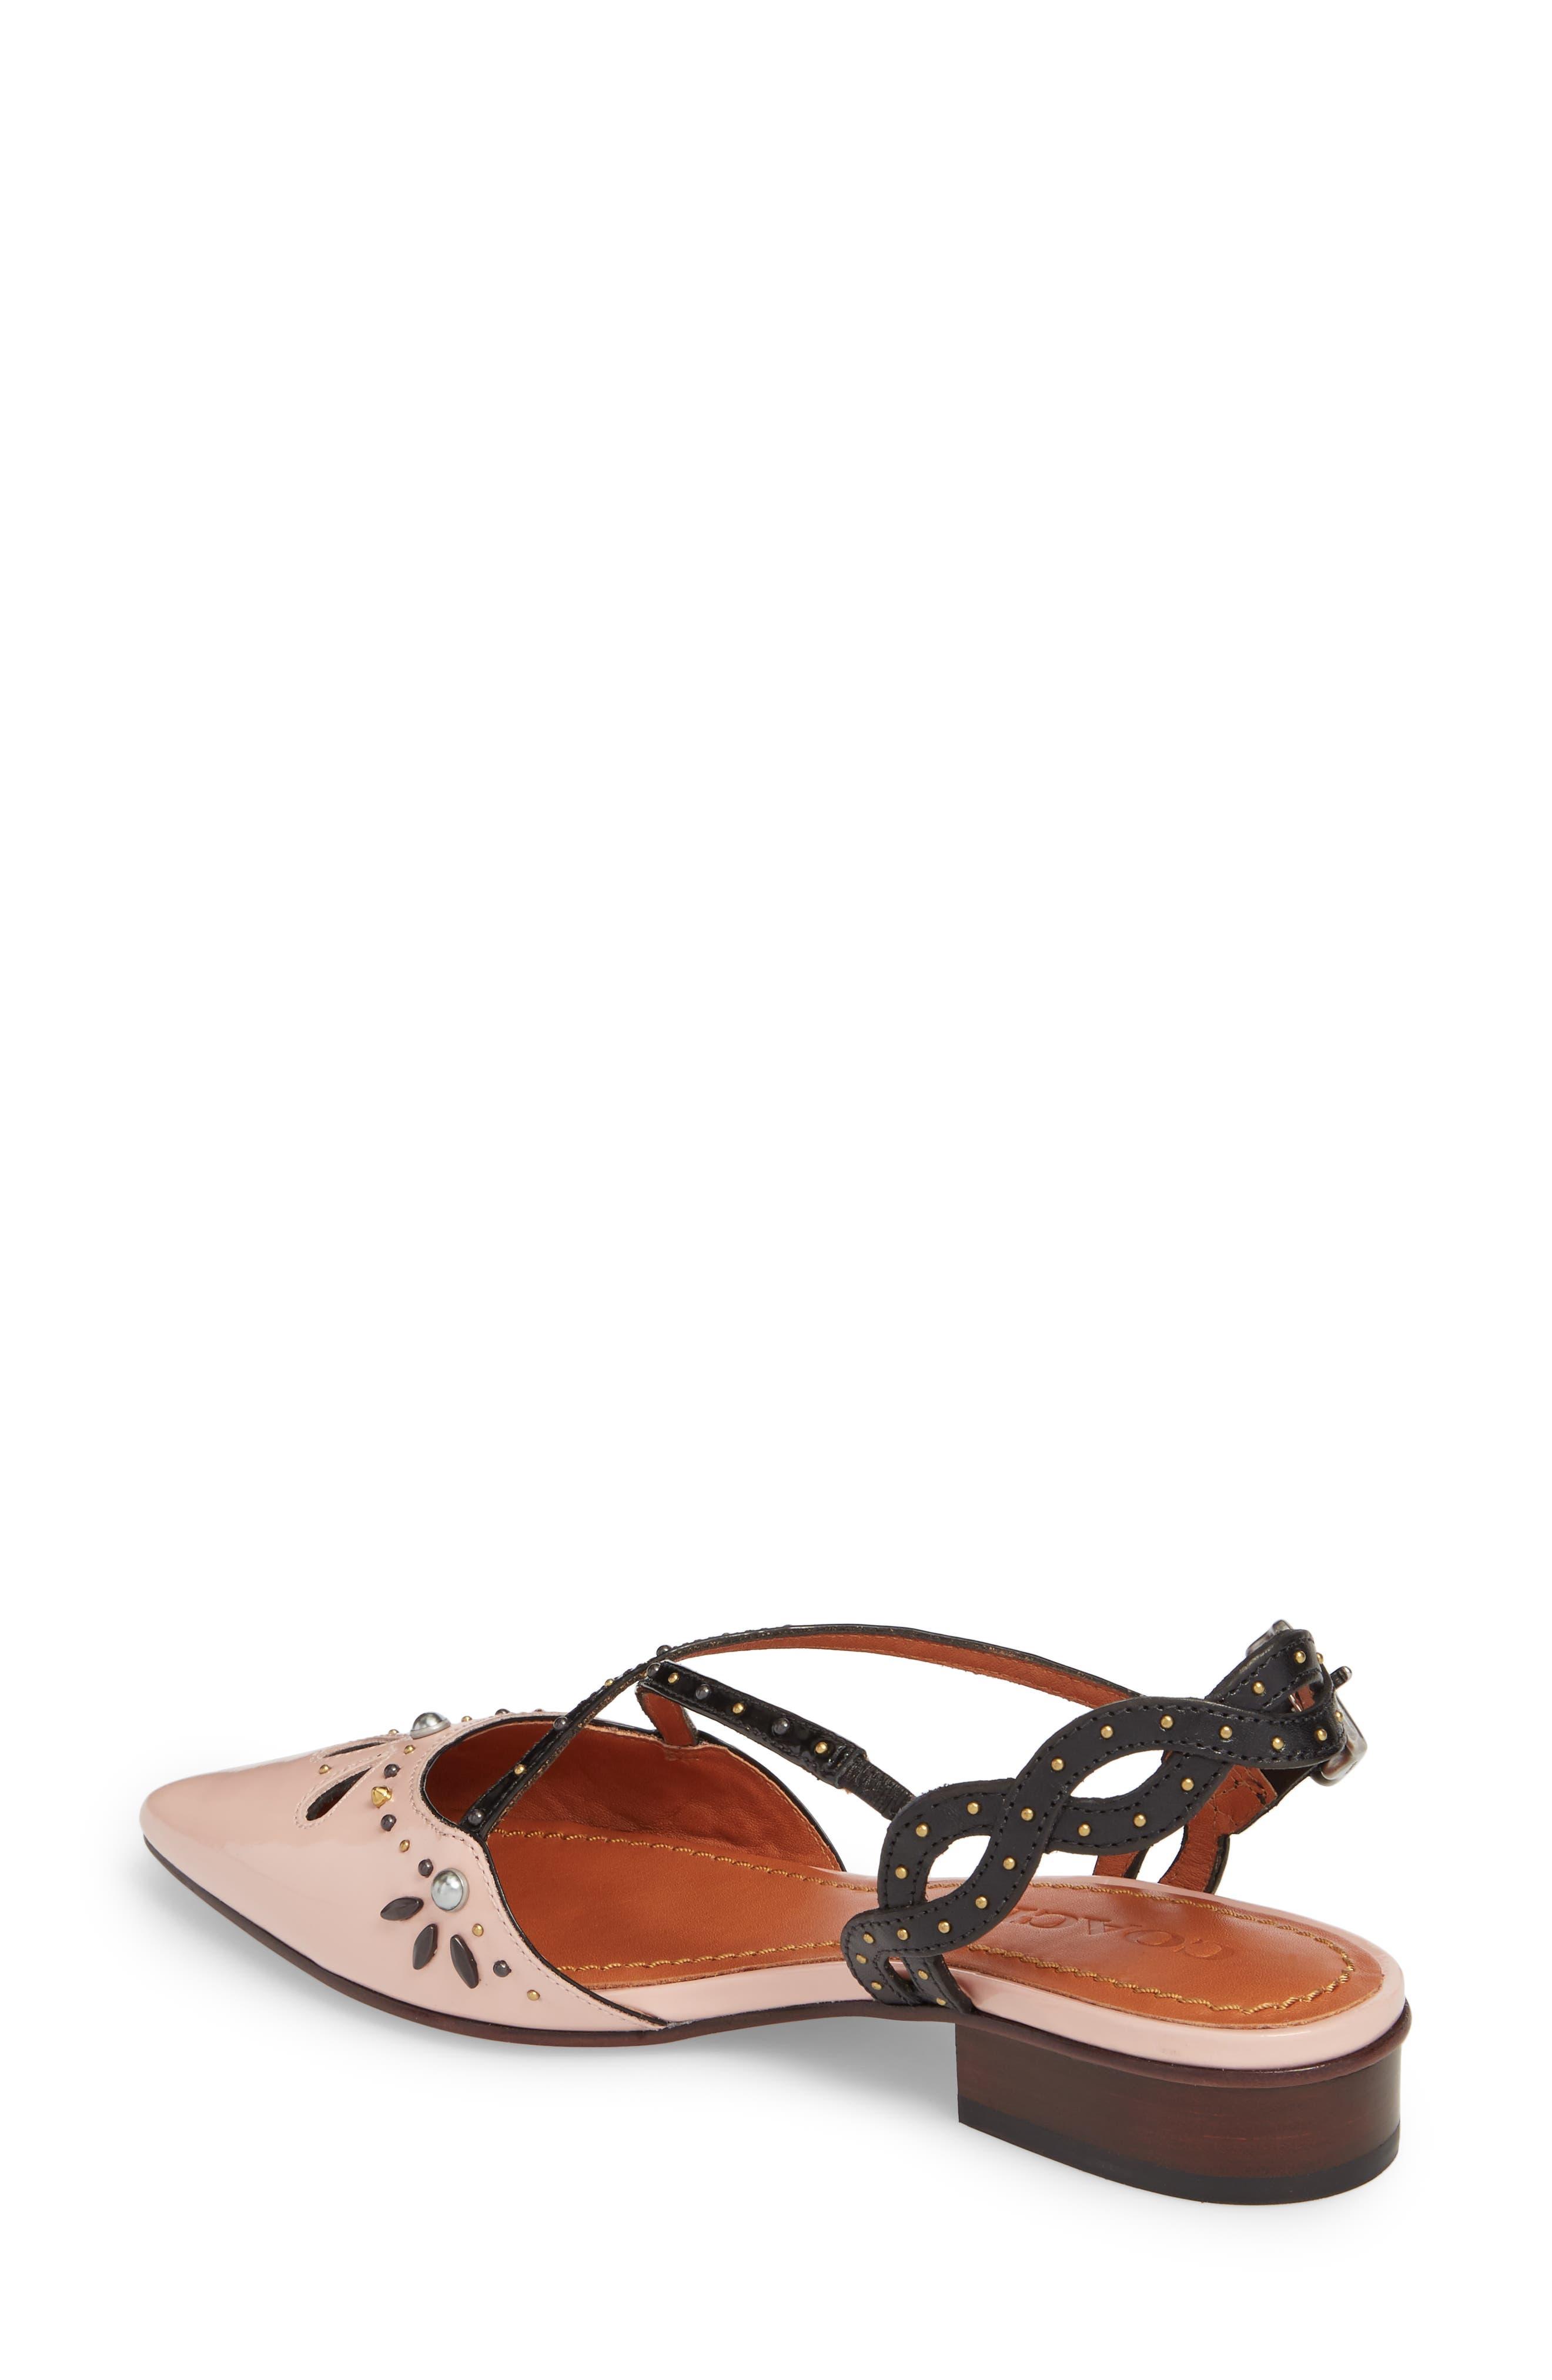 Prairie Rivet Sandal,                             Alternate thumbnail 2, color,                             Pink/ Black Leather